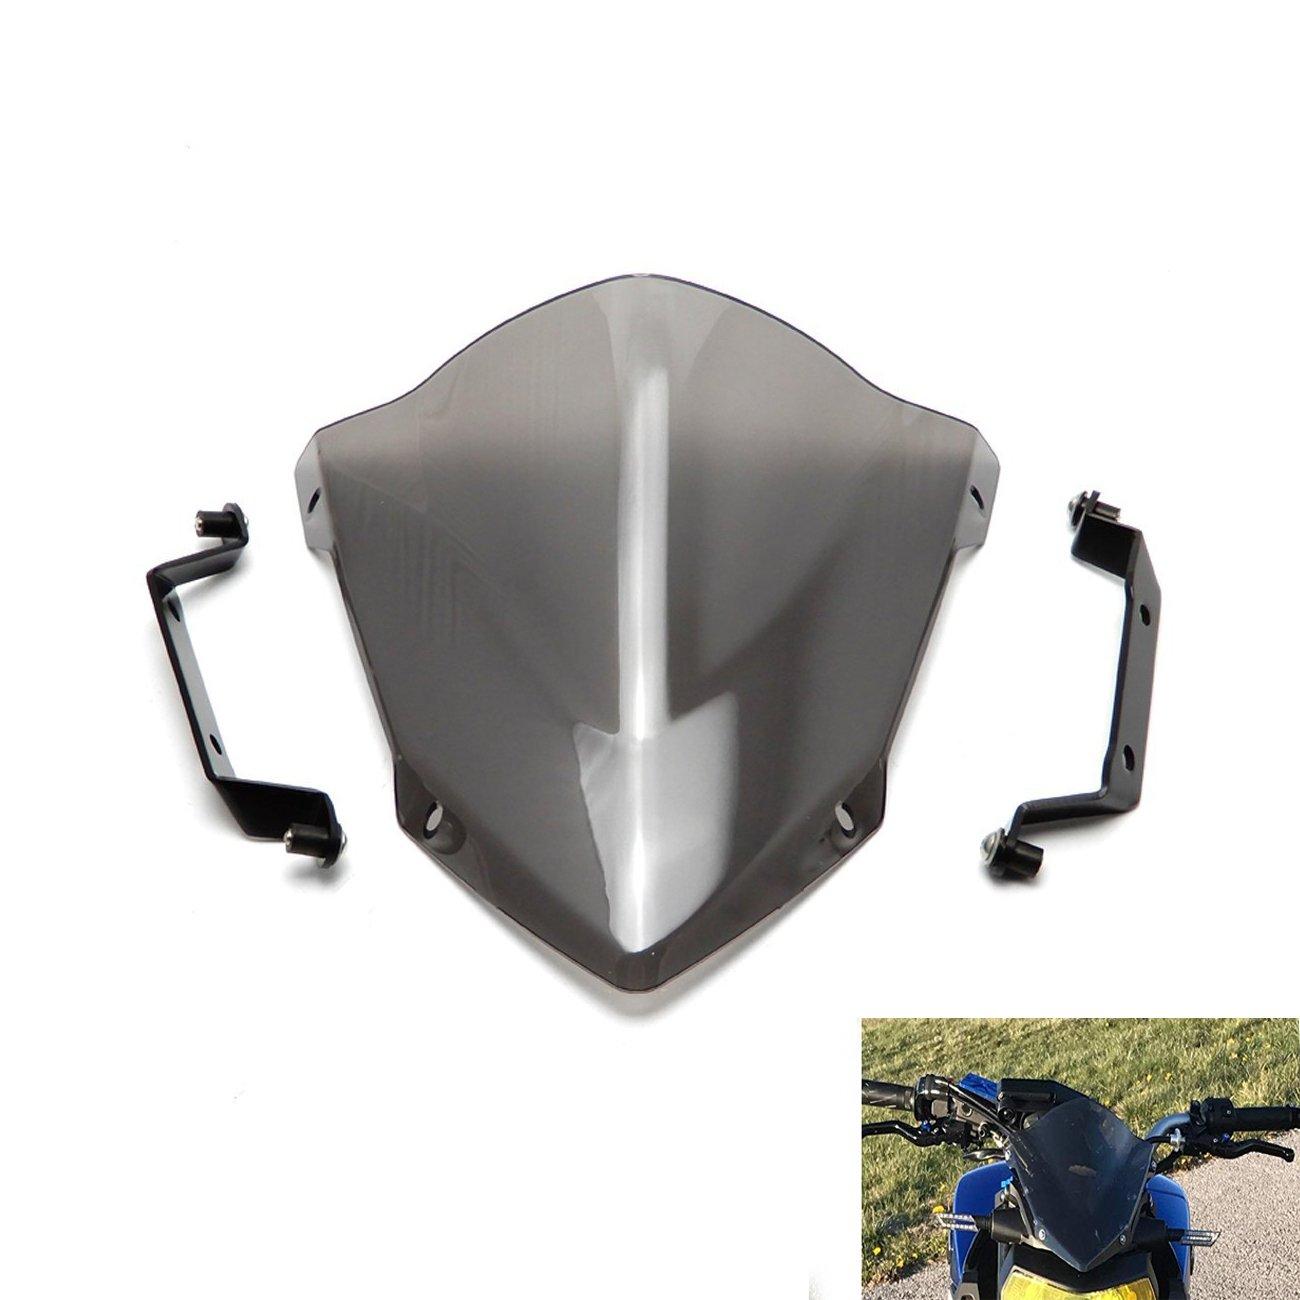 KEMIMOTO FZ 09 Windshield Wind Screen + Bolts Screws Bracket For Yamaha FZ-09 FZ09 2014 2015 2016 by KEMIMOTO (Image #1)